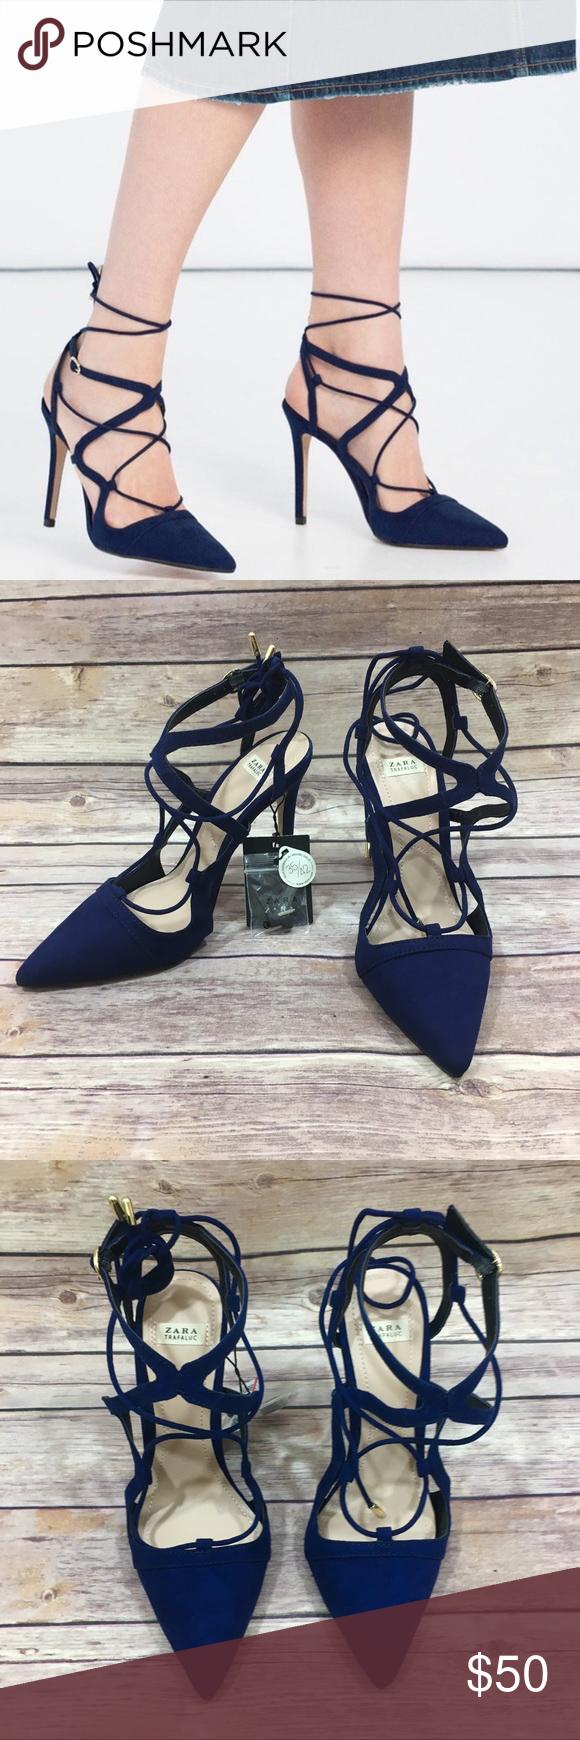 b3d41809b933 NWT Zara Dark Blue Navy Lace Up Heel NWT Zara Dark Blue Navy Lace Up  Stiletto